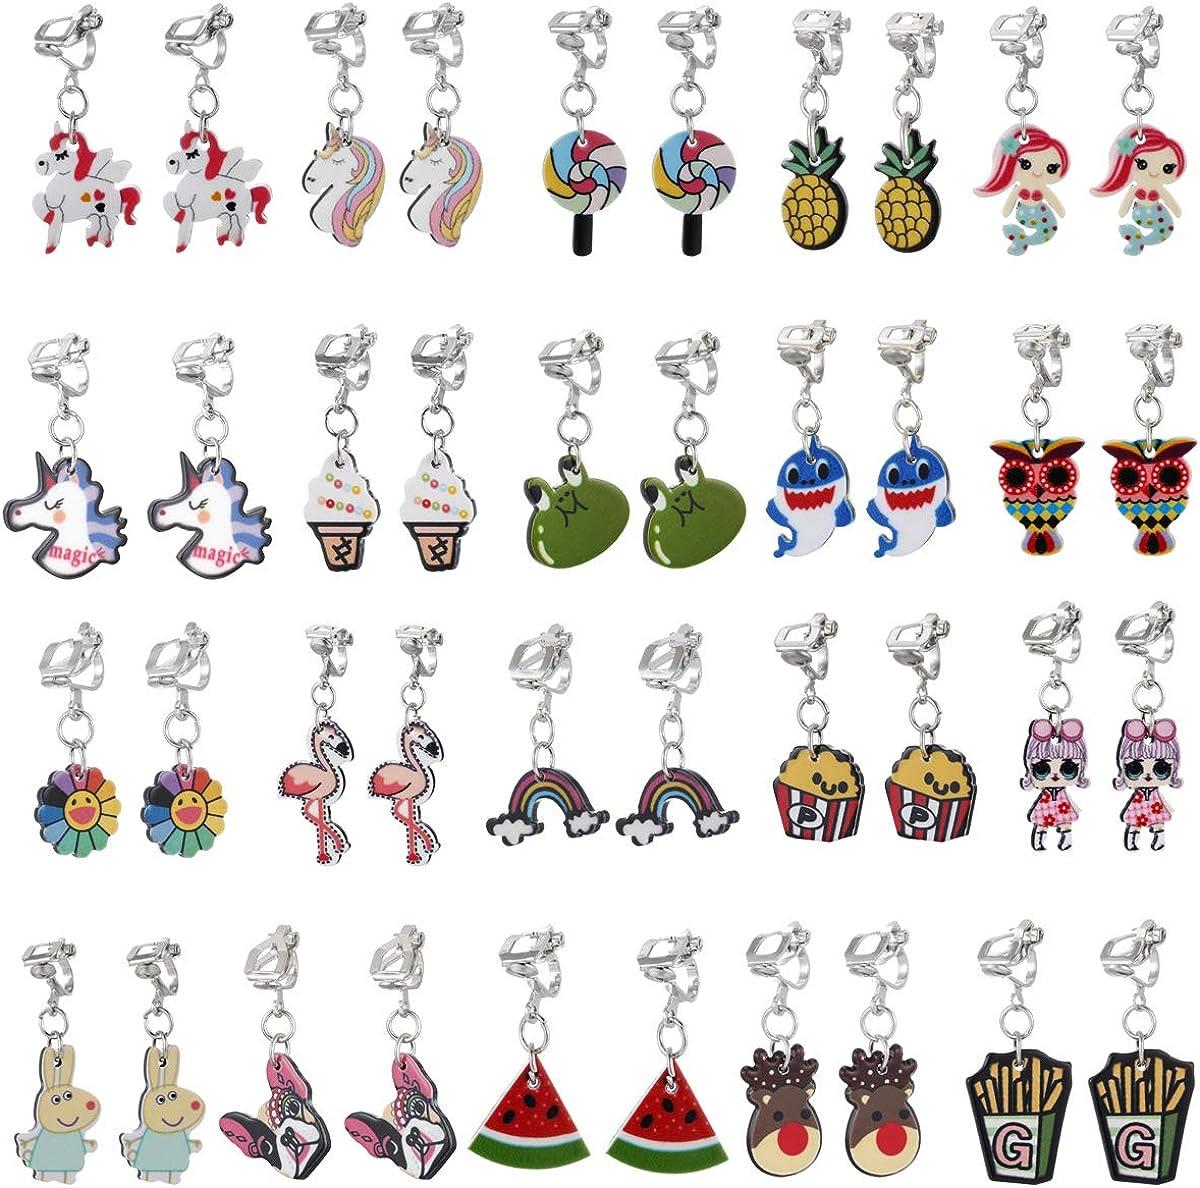 12/20 Pairs Funny Cute Earrings Set, Colorful Enamel Charms Ear Jewelry, Unique Personalized Dangle Hoop Earring, Hypoallergenic Copper Leverback Earrings for Little Teen Girls and Women